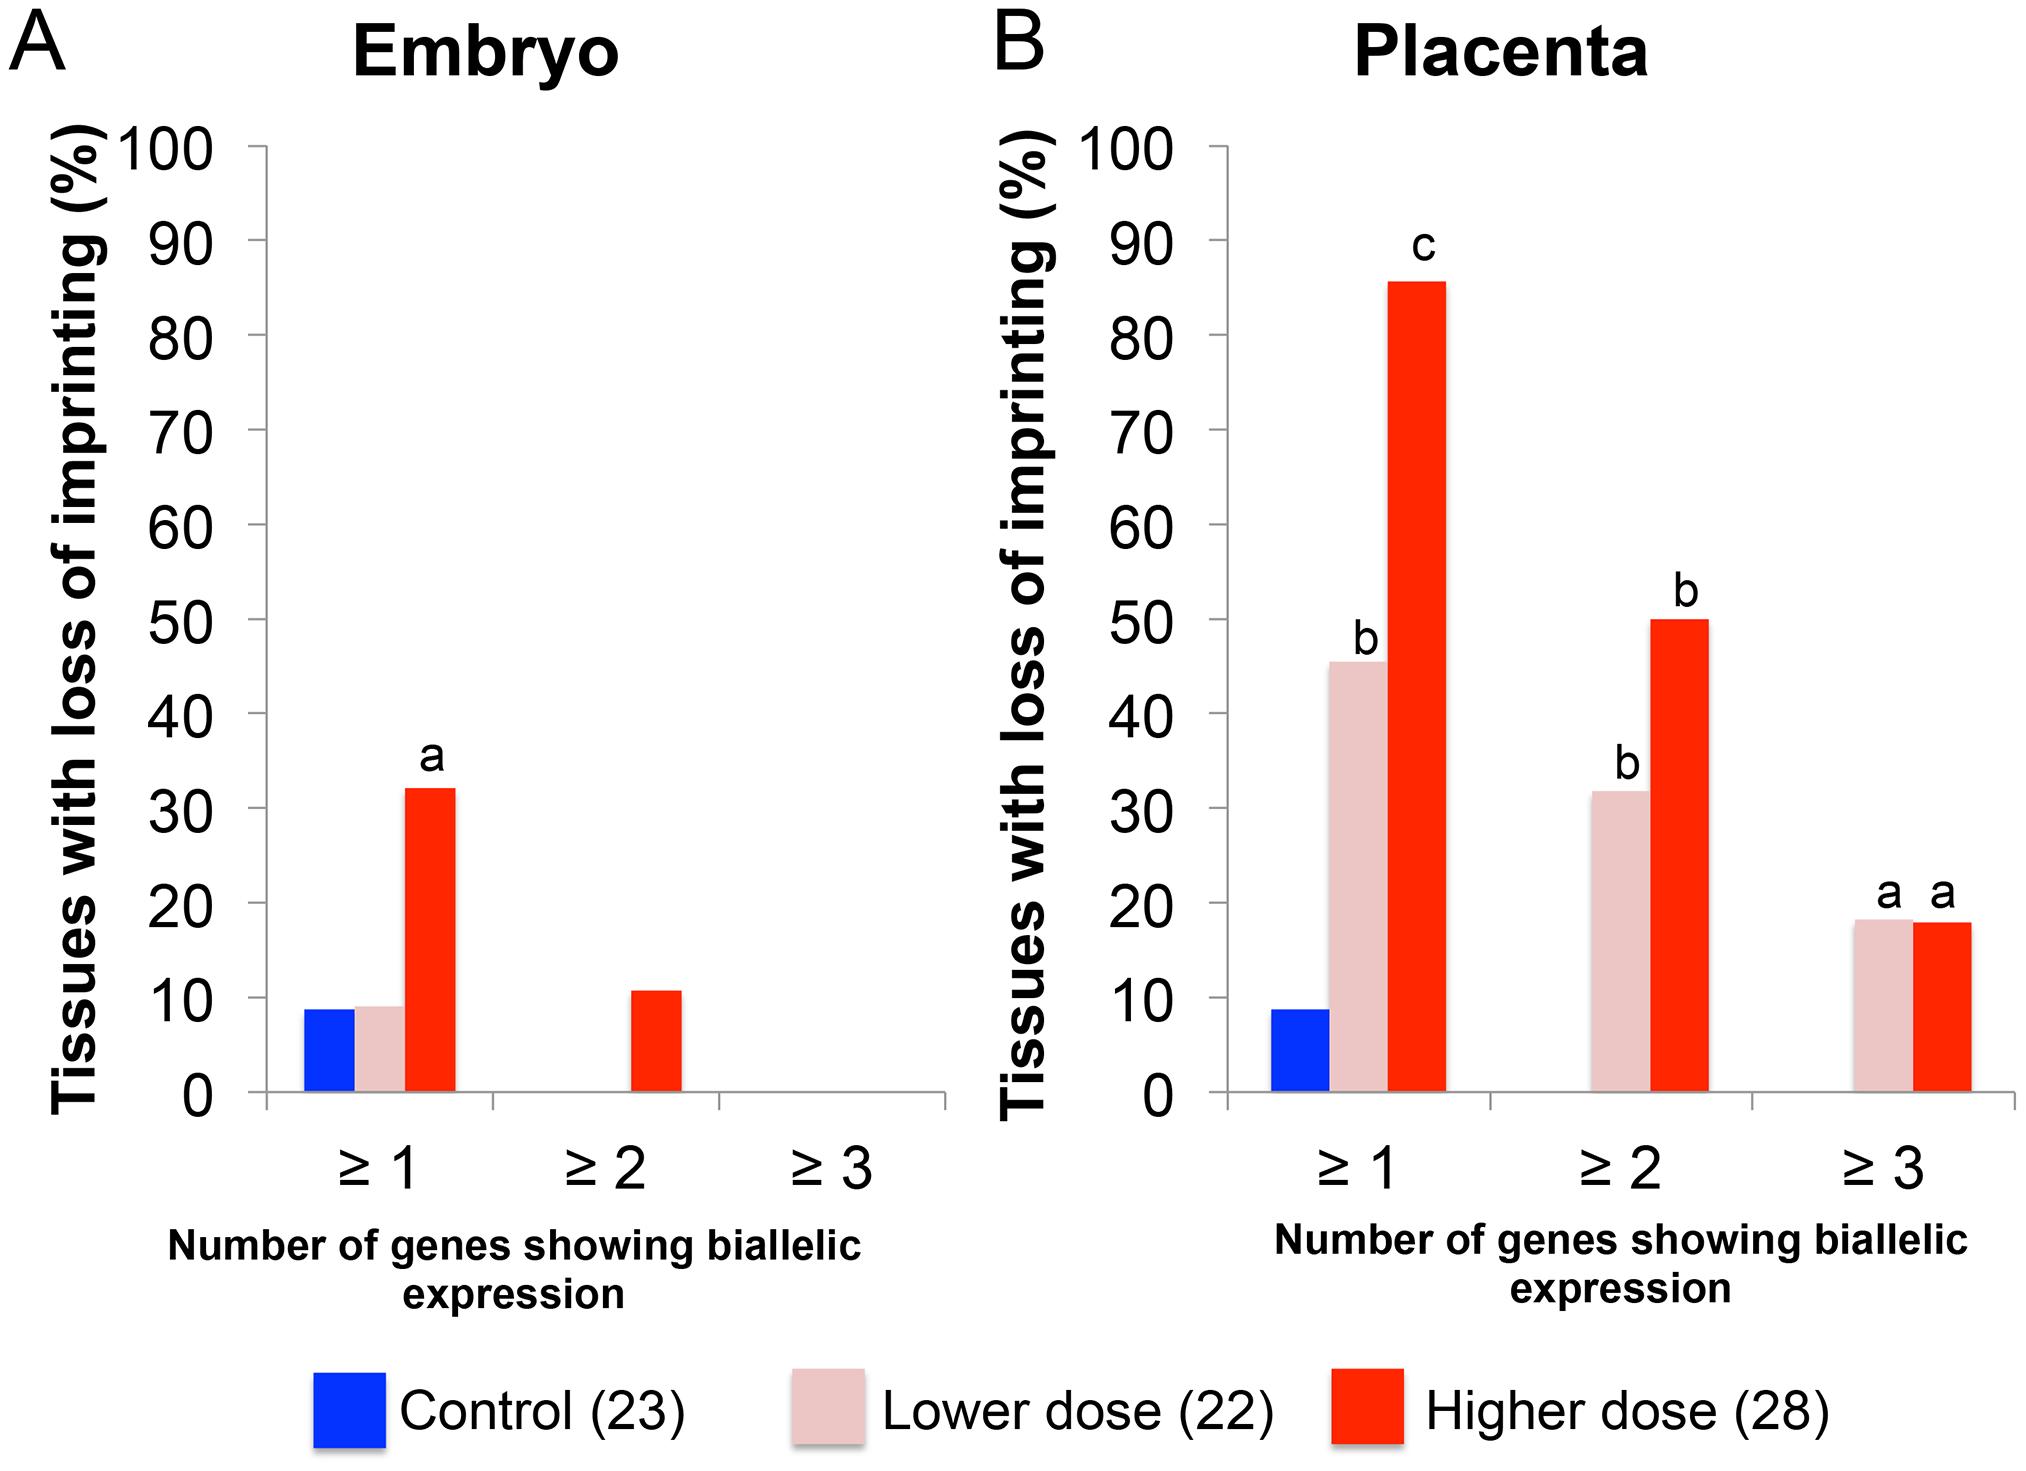 Impact of BPA exposure is shown as number of genes exhibiting imprinting perturbations.